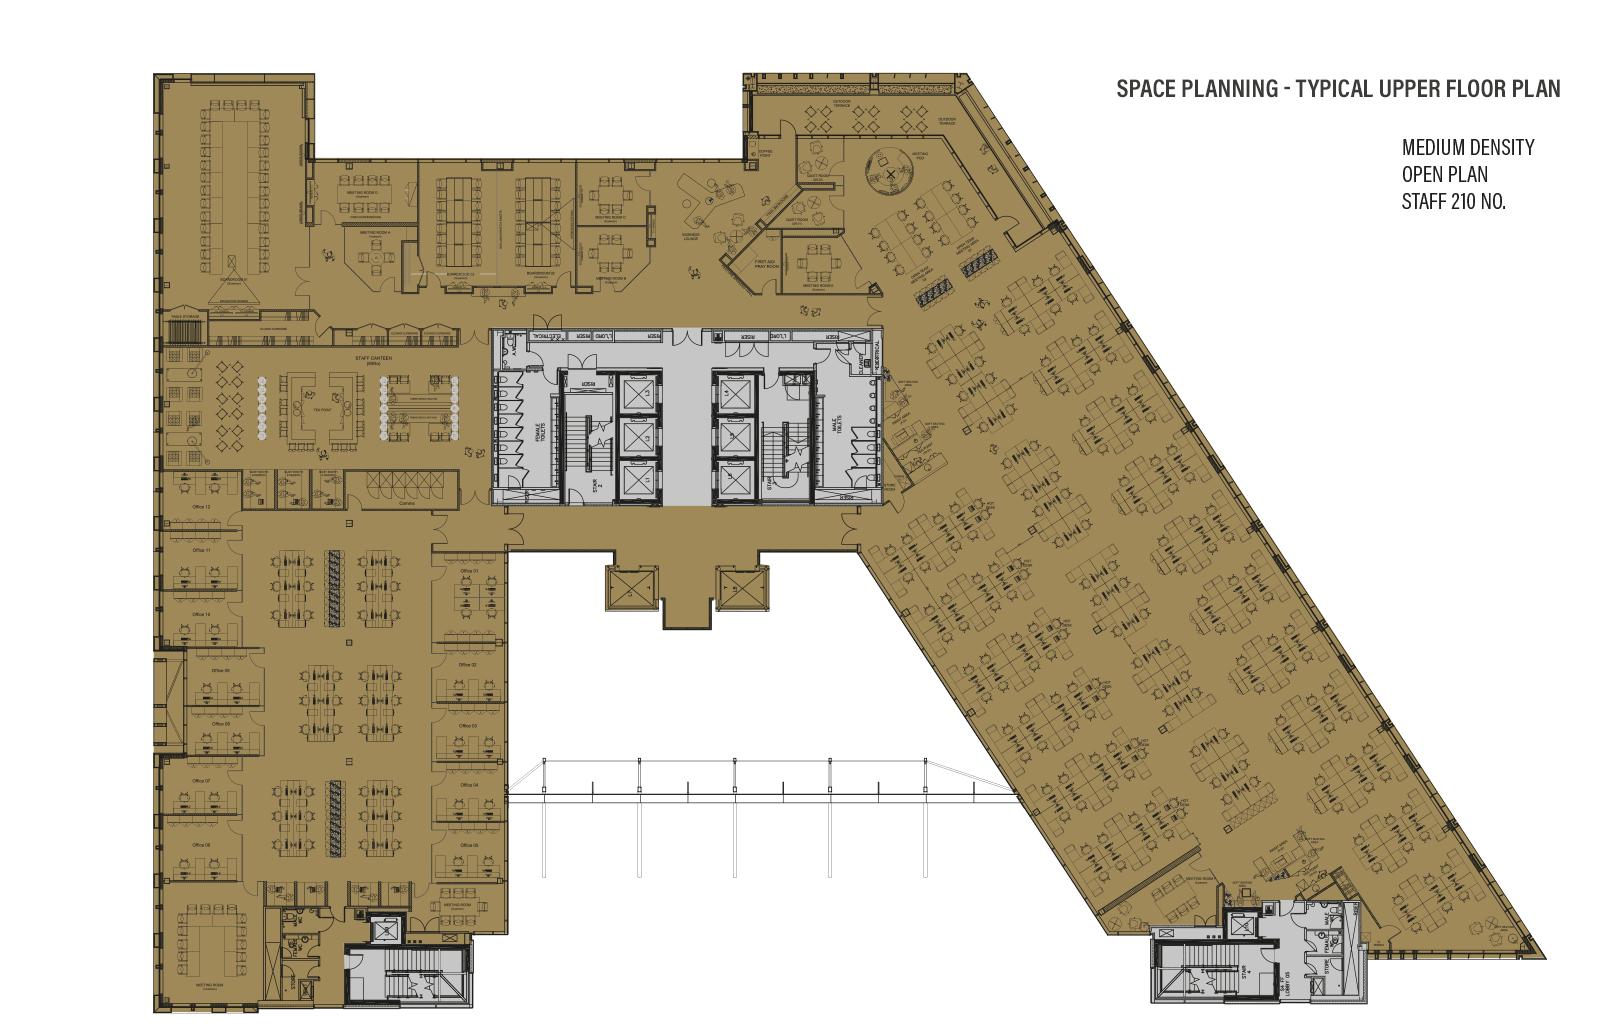 Typical Upper Floor - Space Planning - Medium